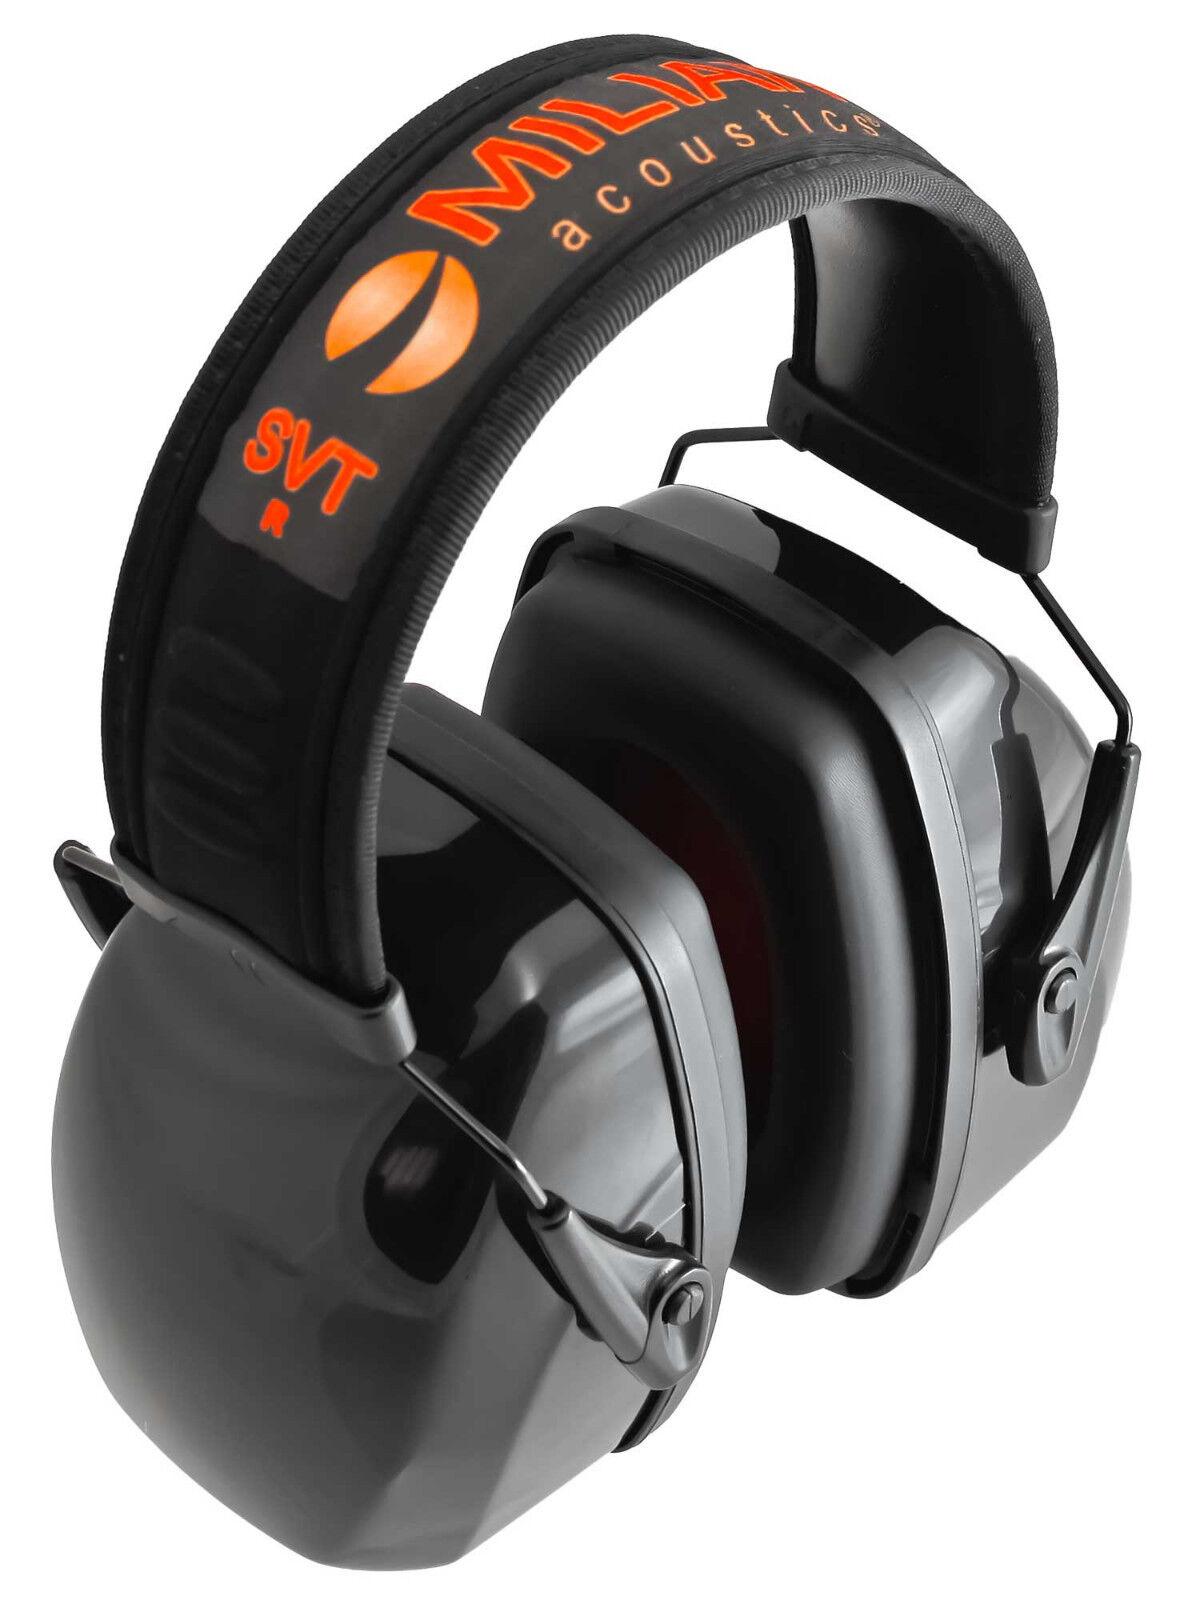 SVT Isolation Studio Mixing Console Reference Headphone